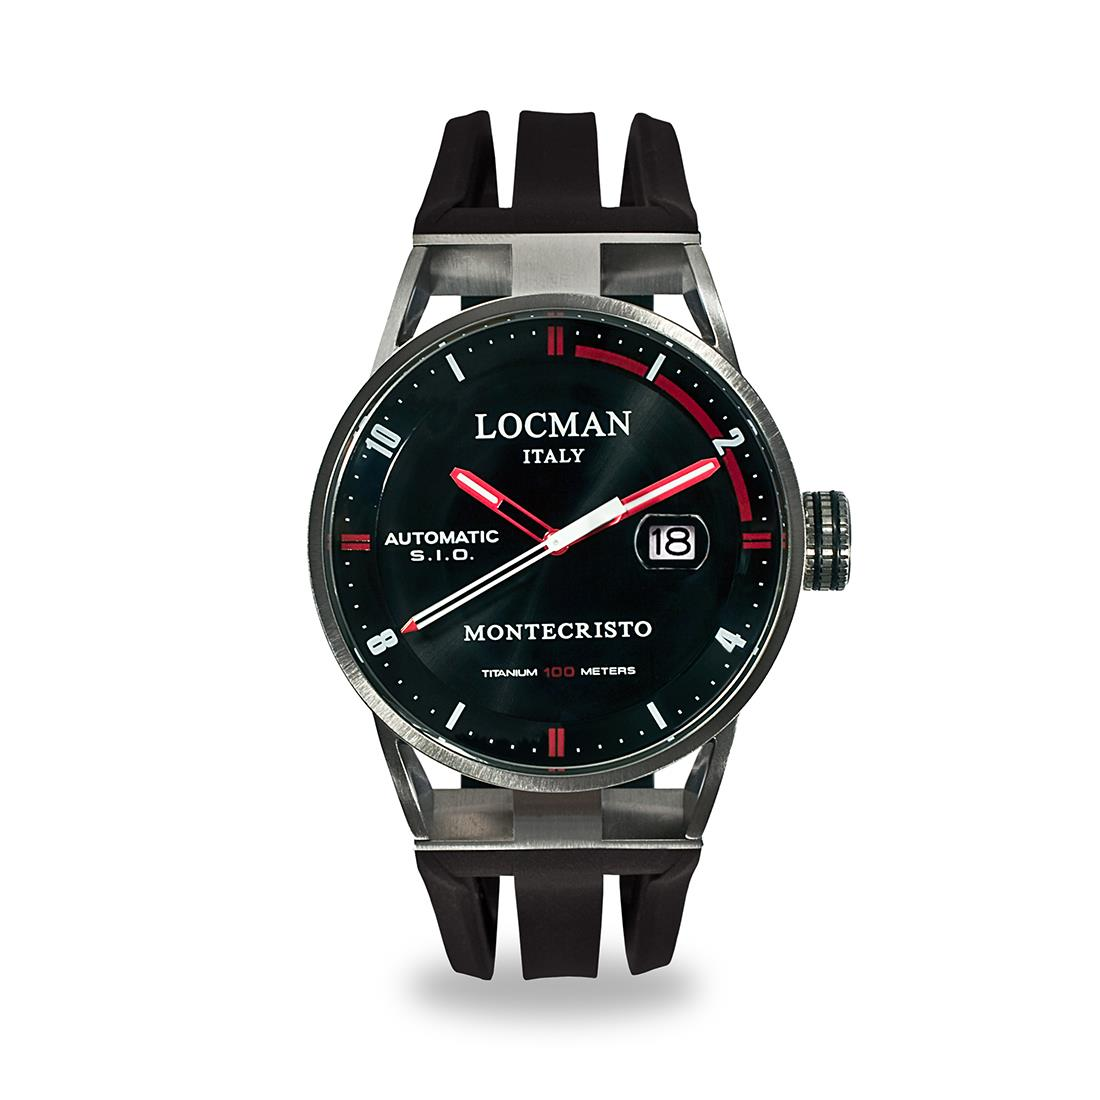 Orologio cassa 44mm - LOCMAN